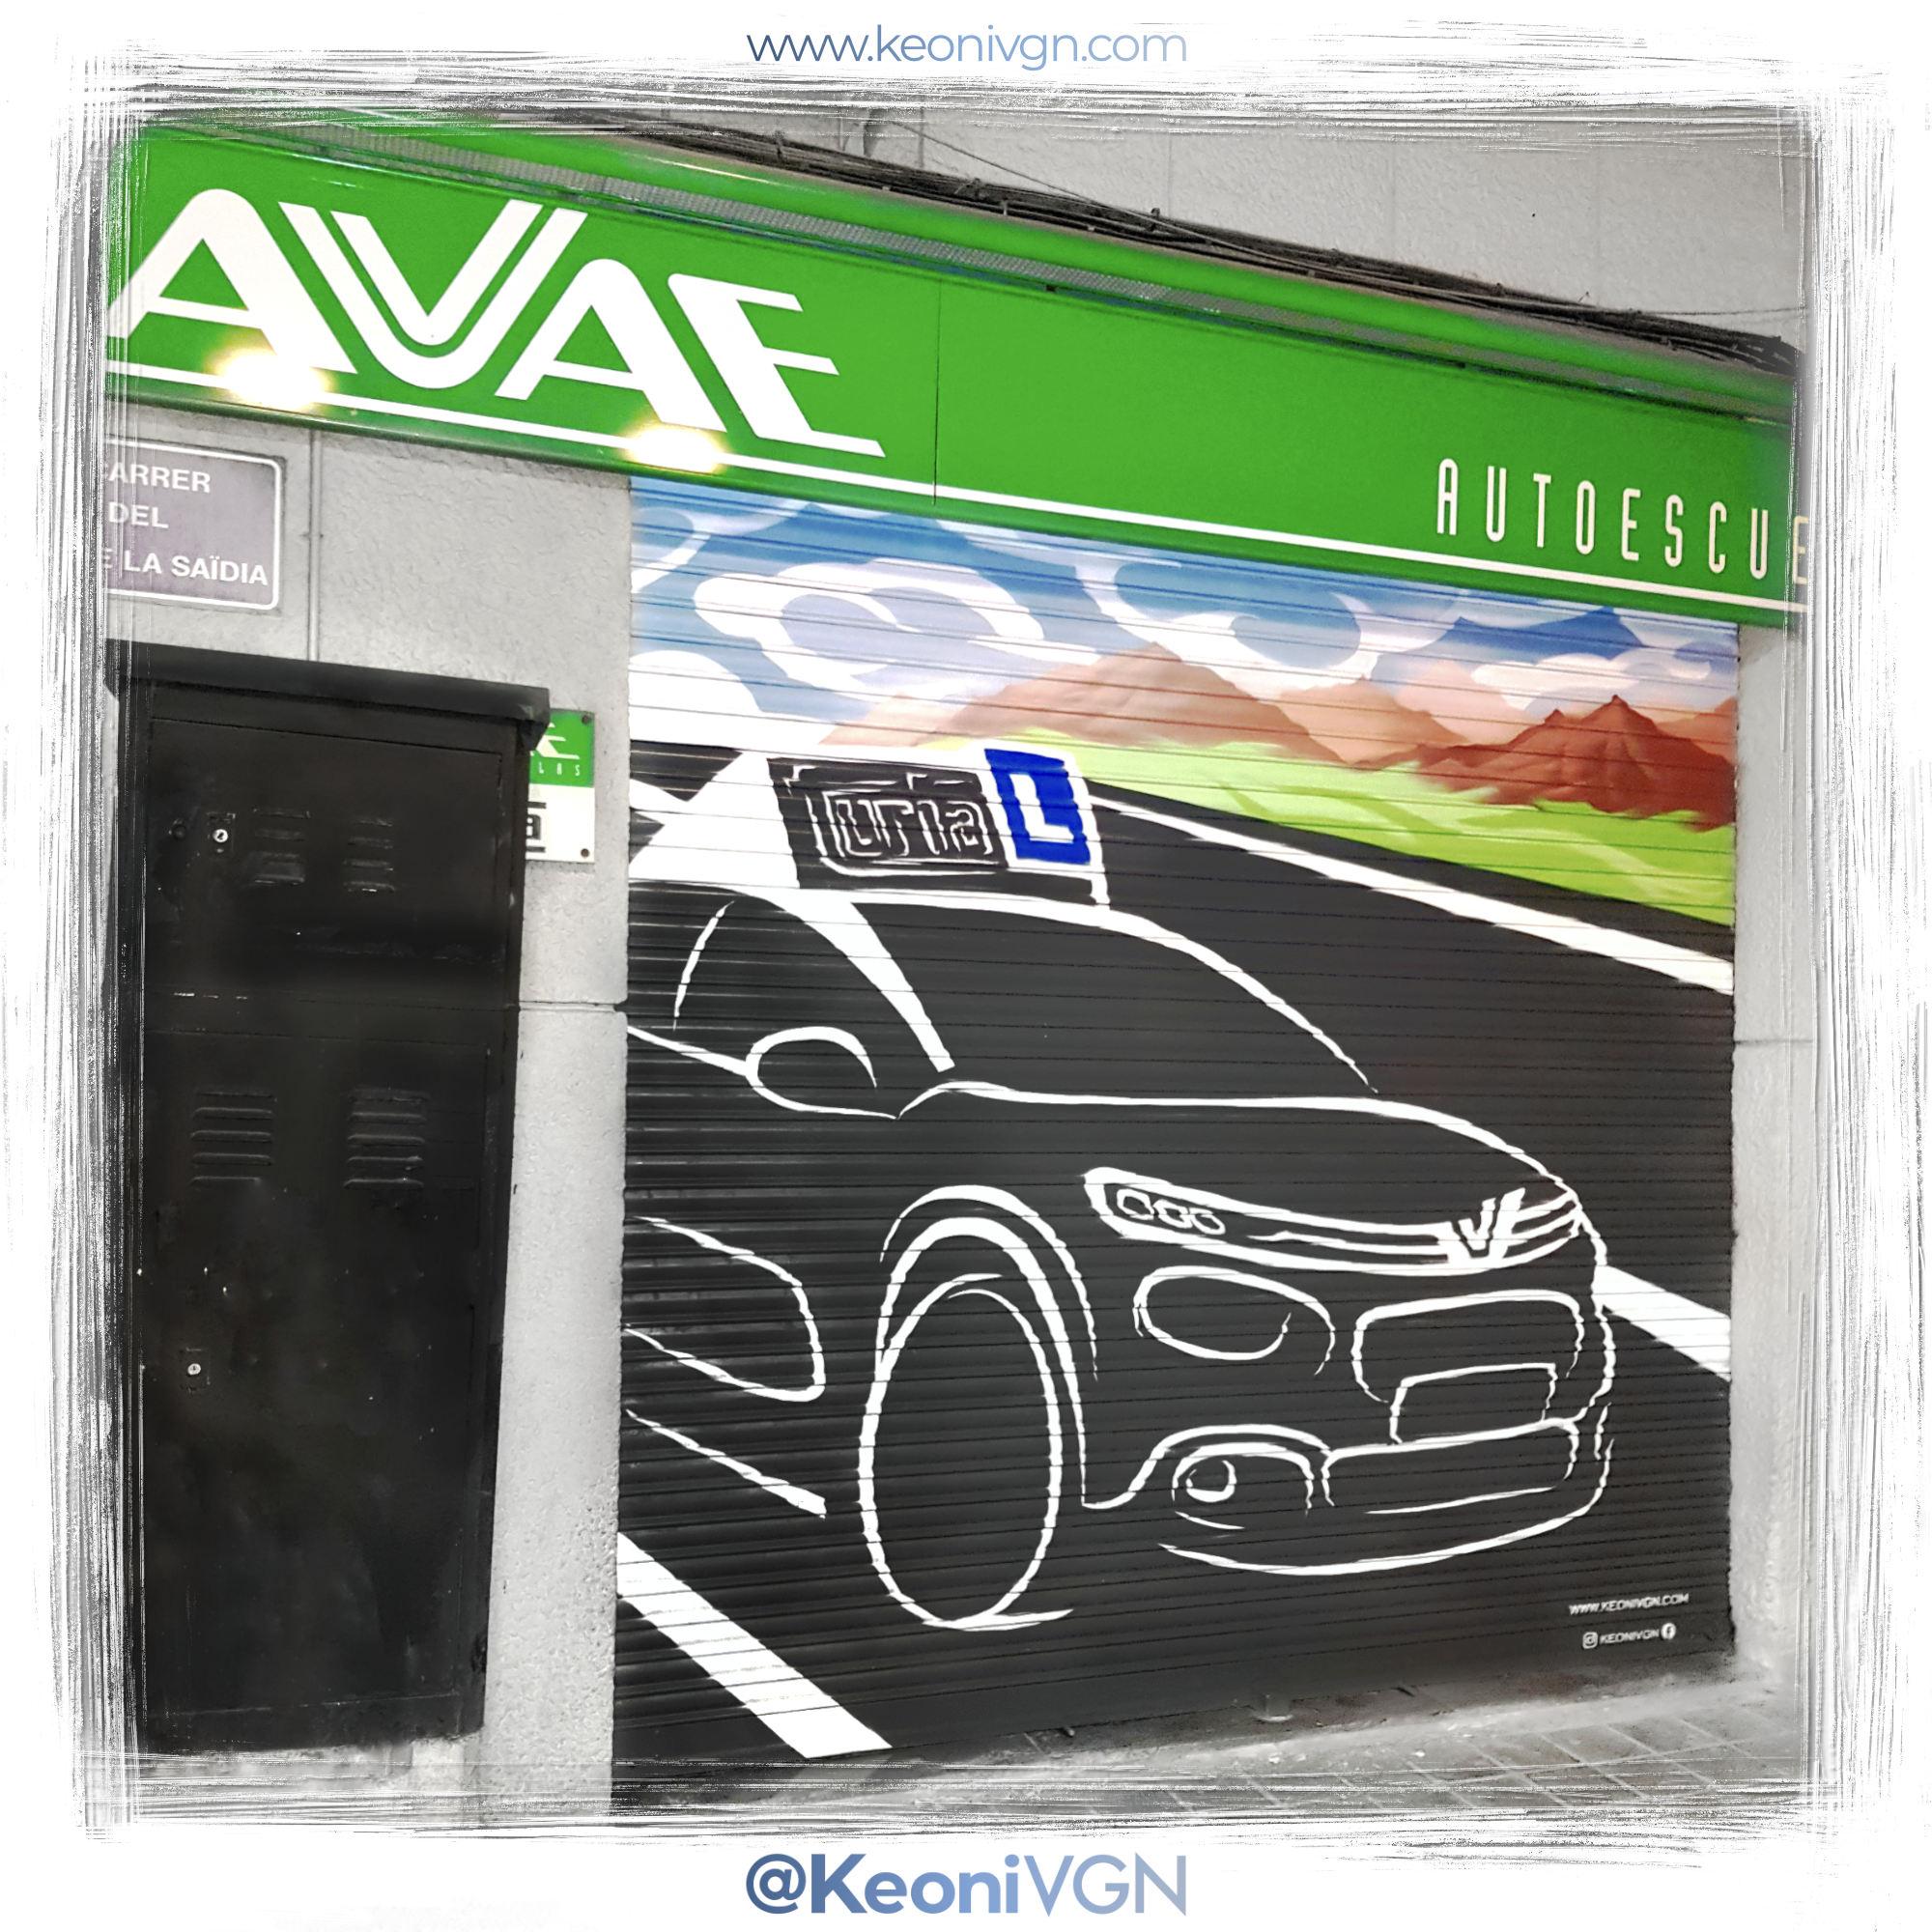 Mural Autoescuela AVAE 2